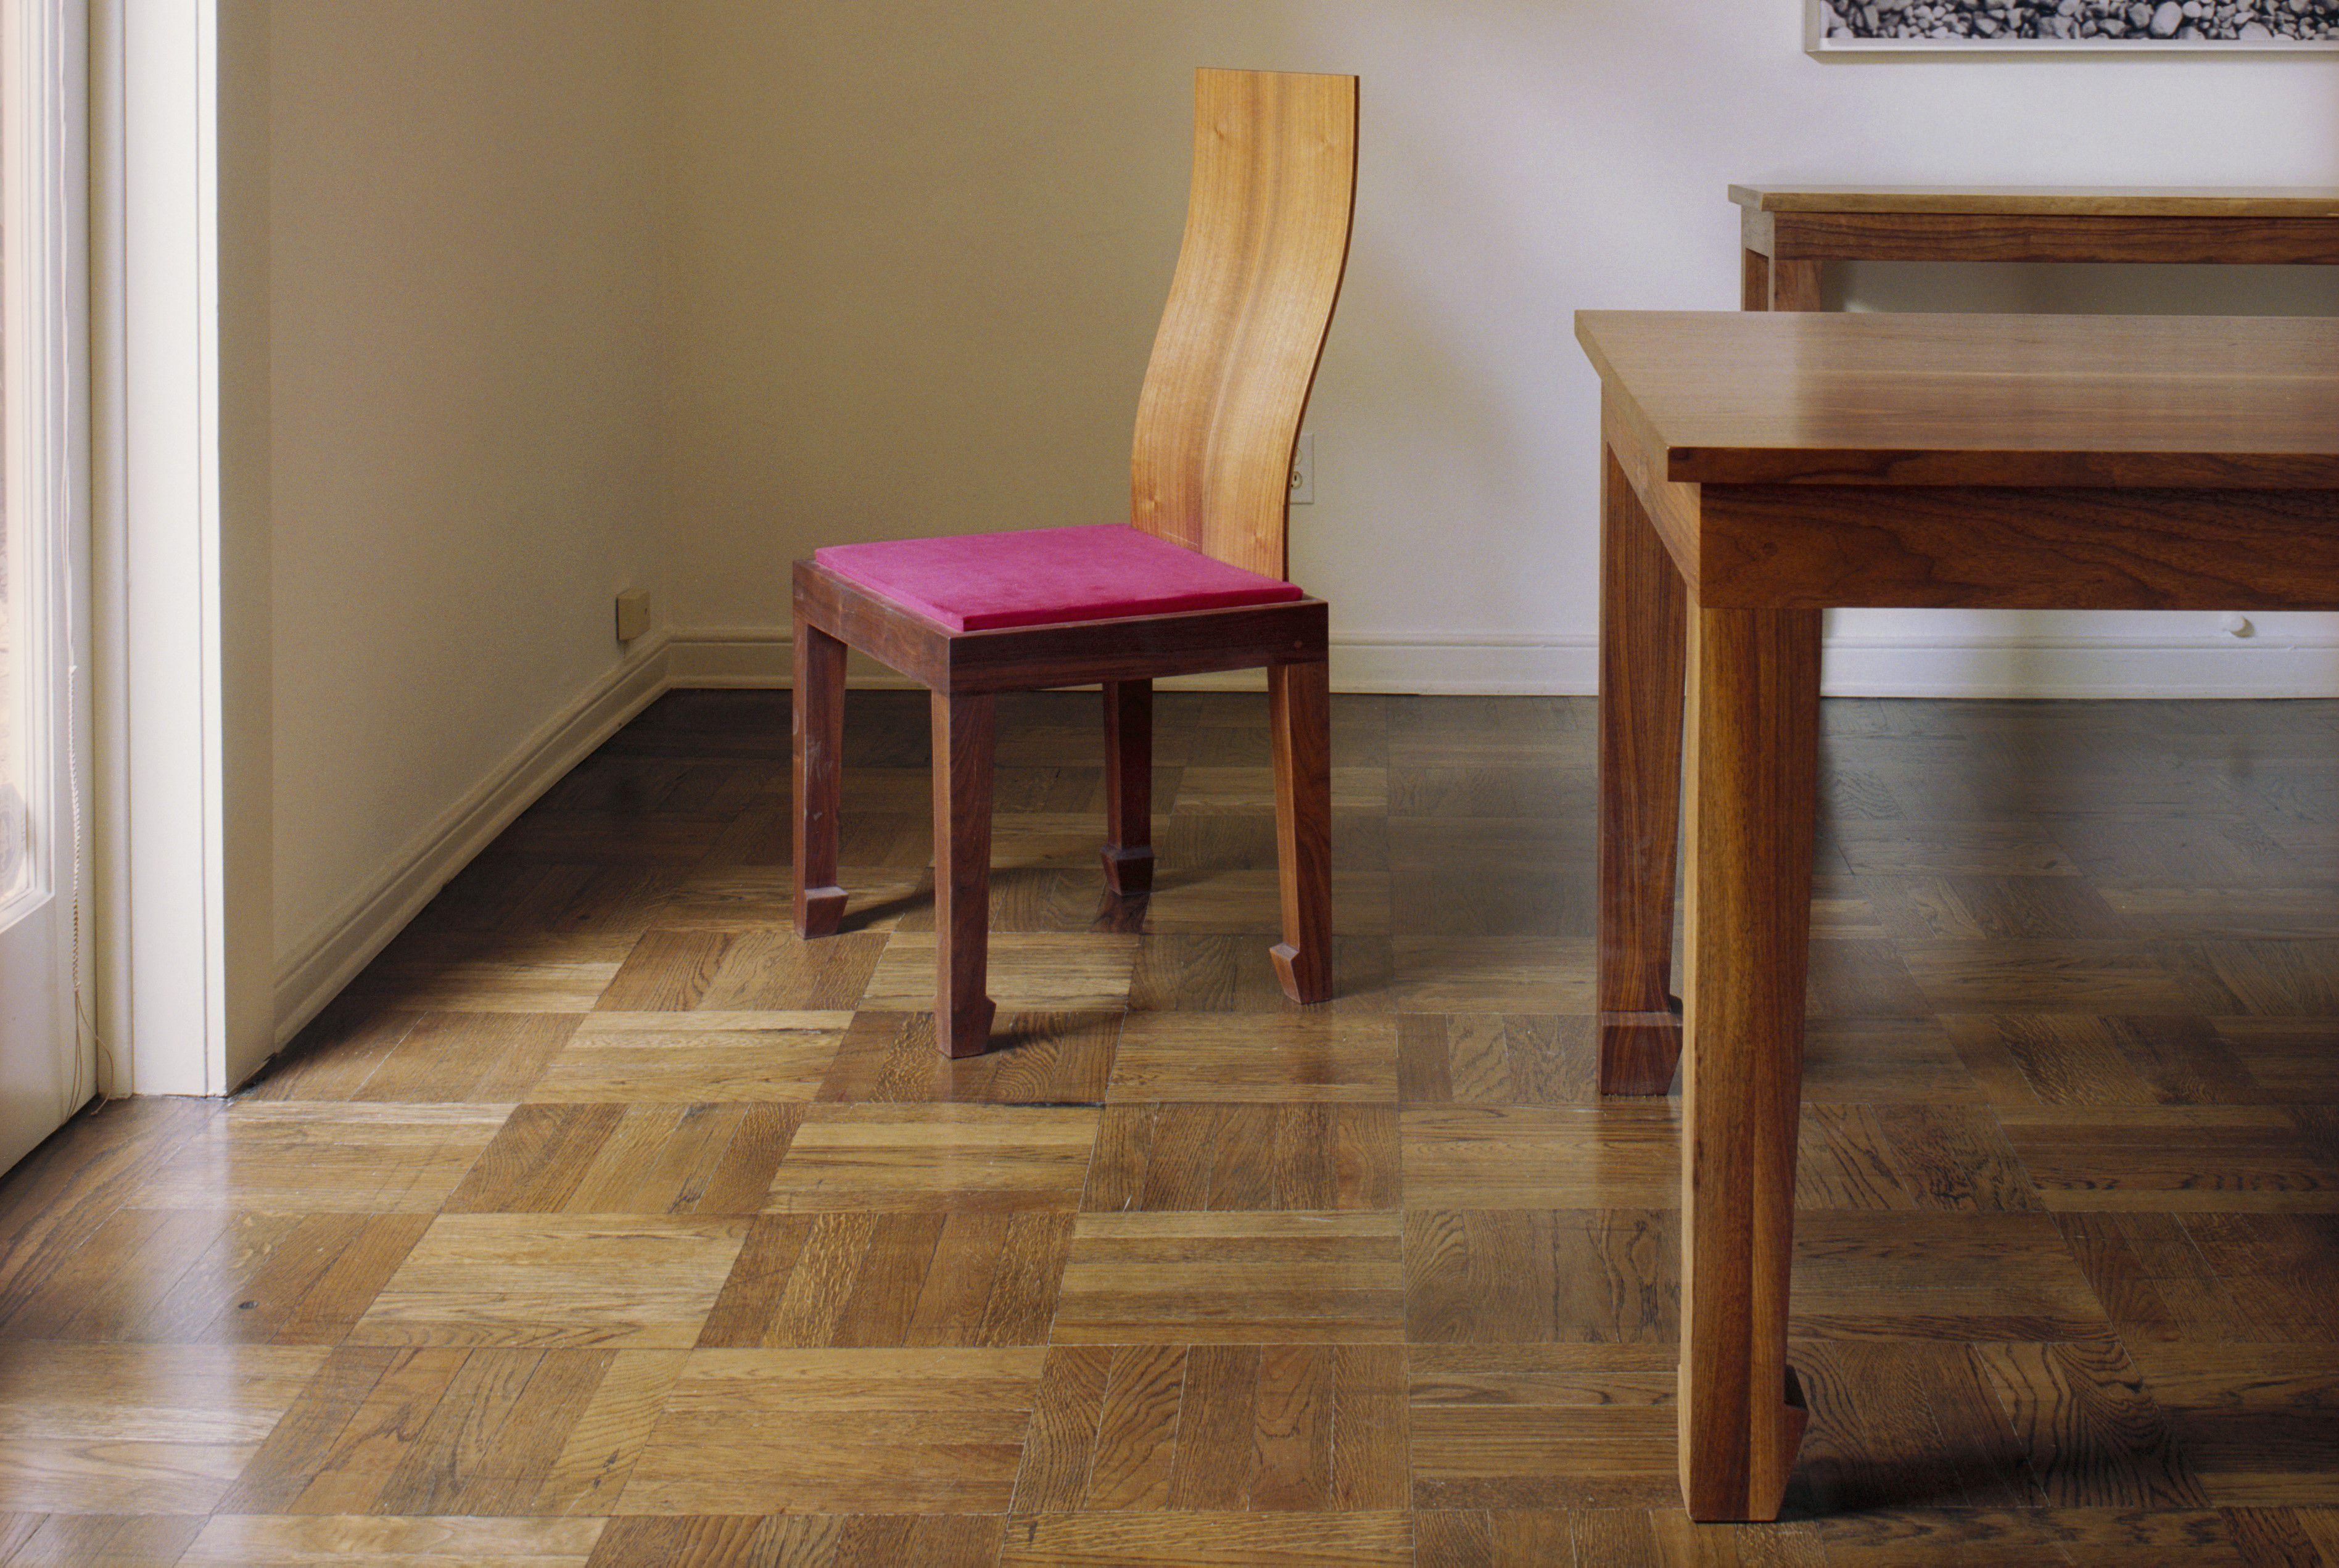 best hardwood flooring toronto of wood parquet flooring poised for a resurgence within wood parquet flooring 529502452 576c78195f9b585875a1ac13